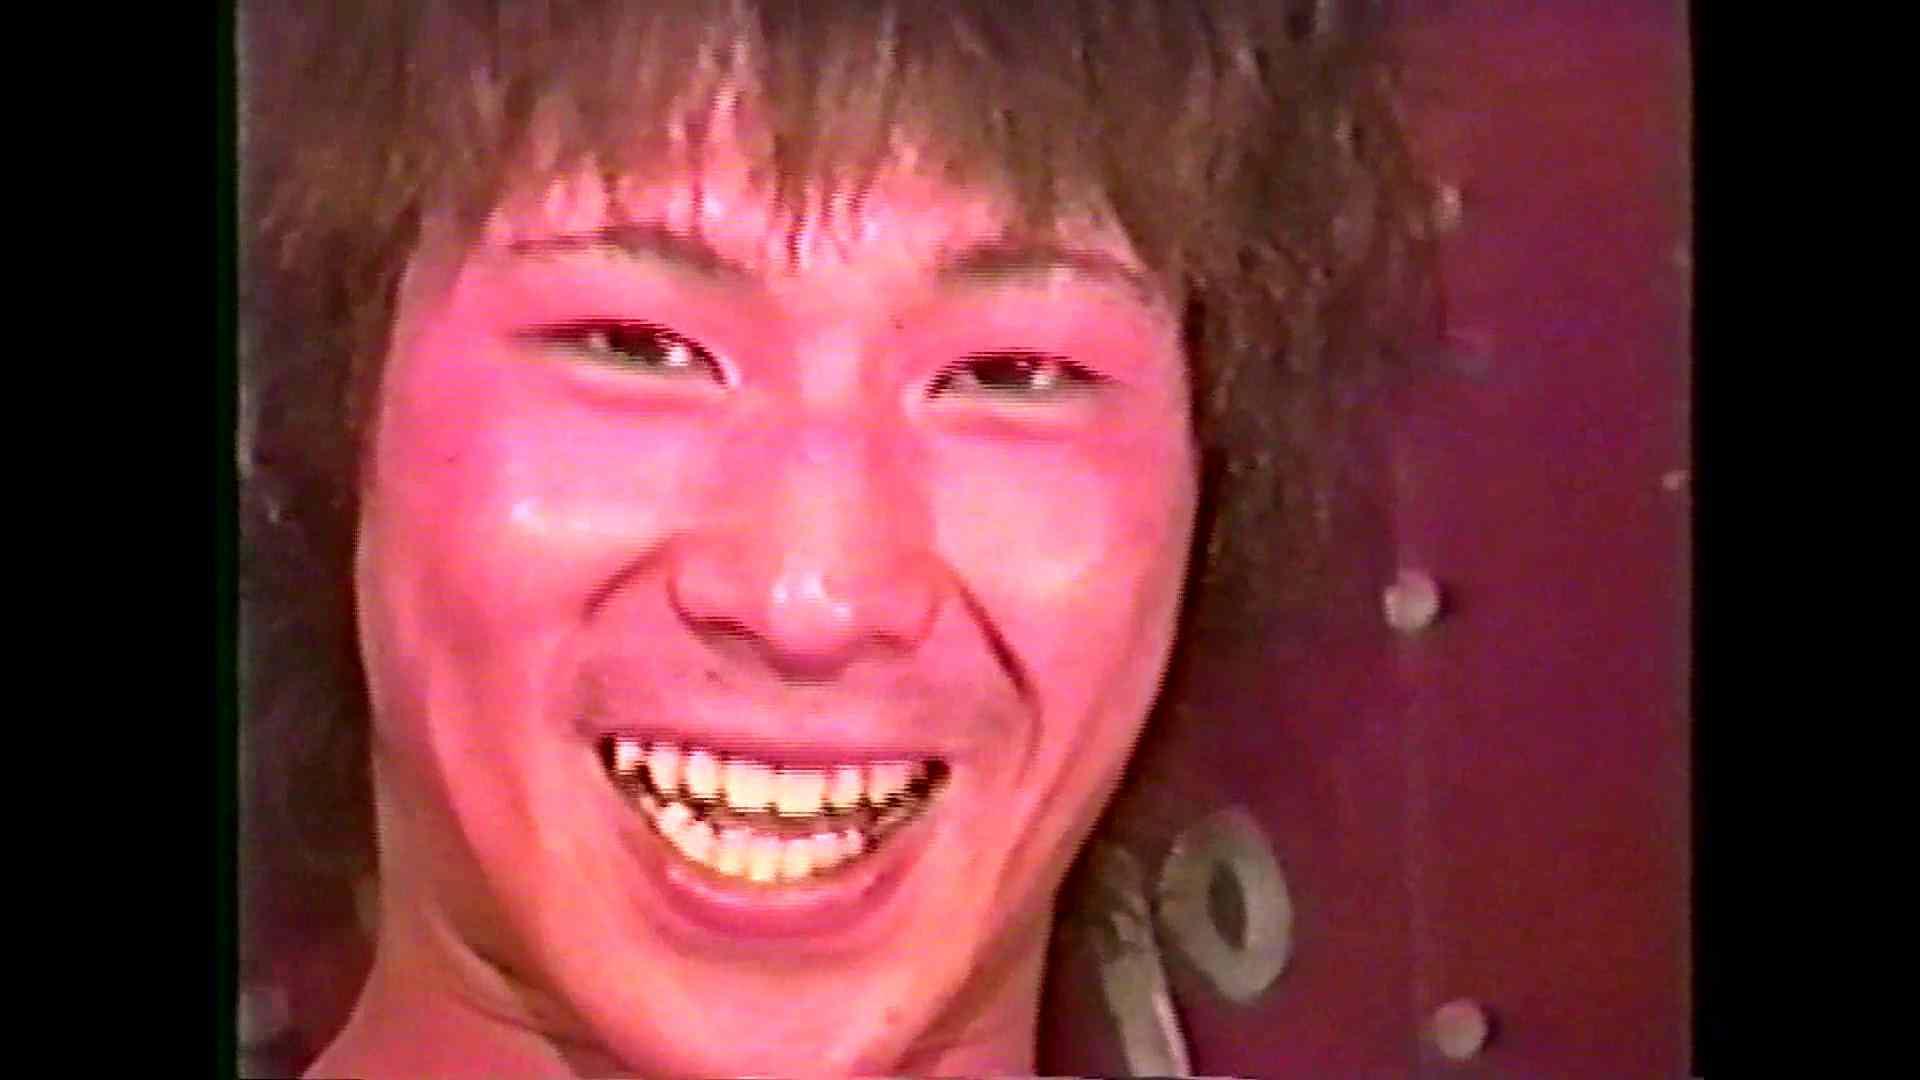 GAYBOY宏のオカズ倉庫Vol.3-4 ゲイのシックスナイン ゲイ無料エロ画像 91pic 78